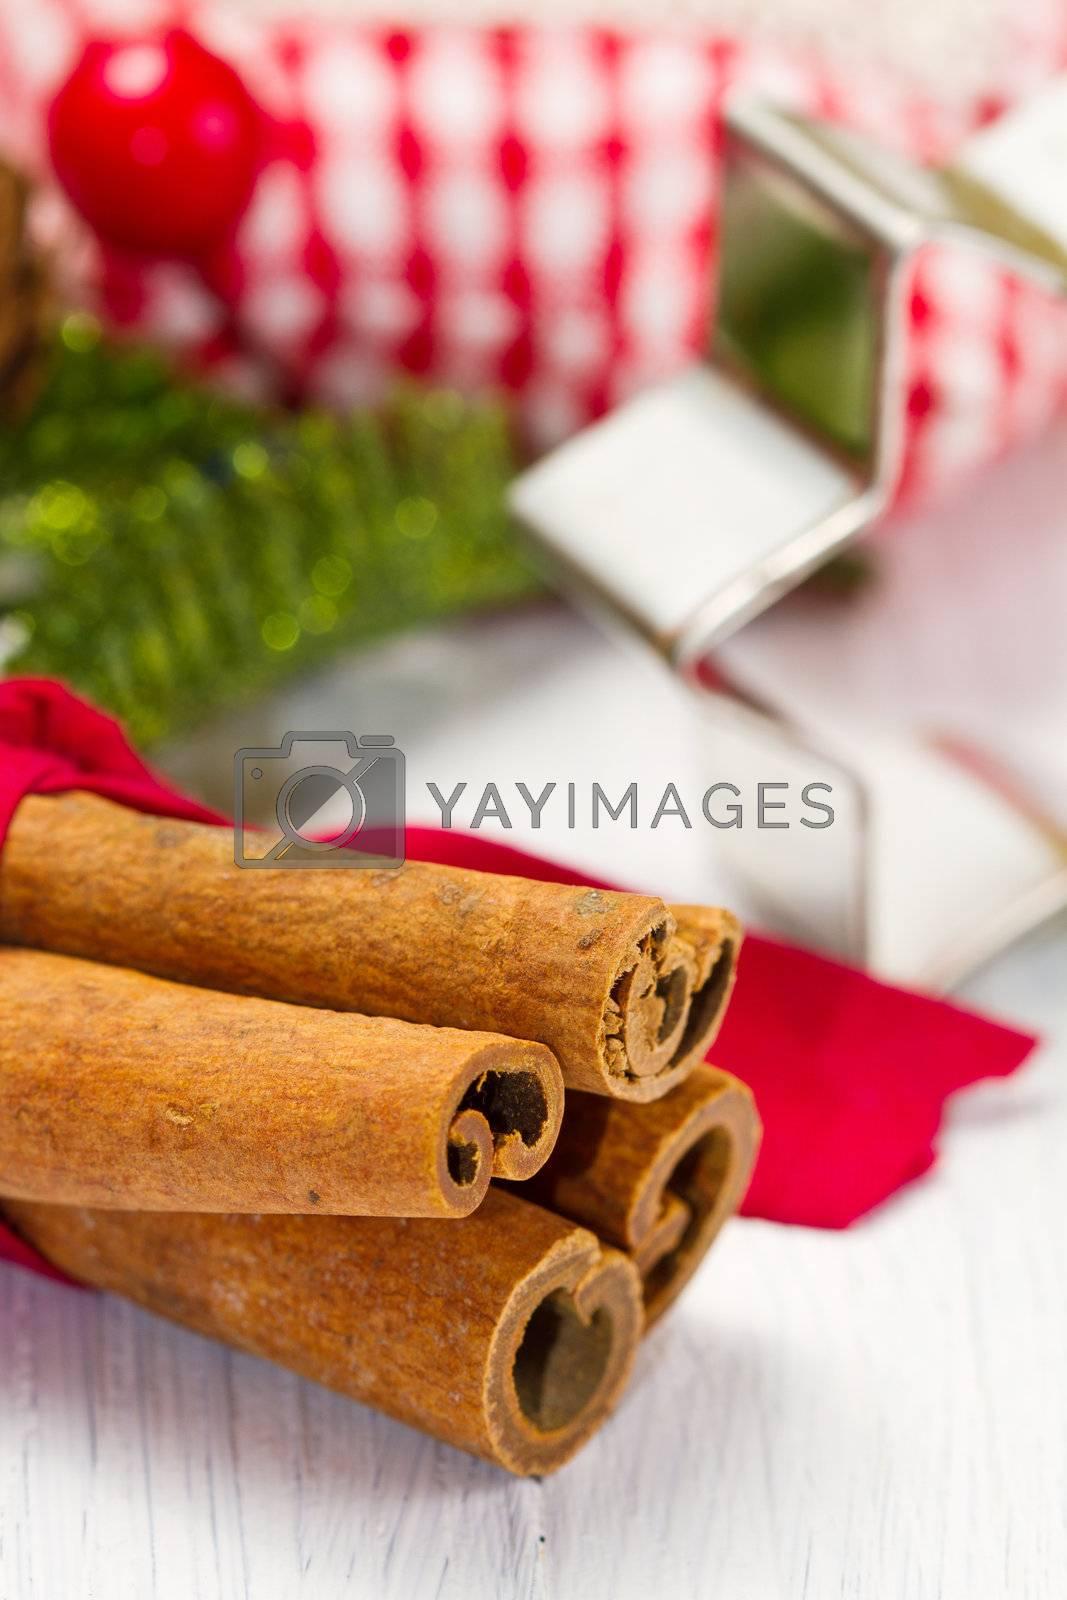 cinnamon sticks with decoration on white